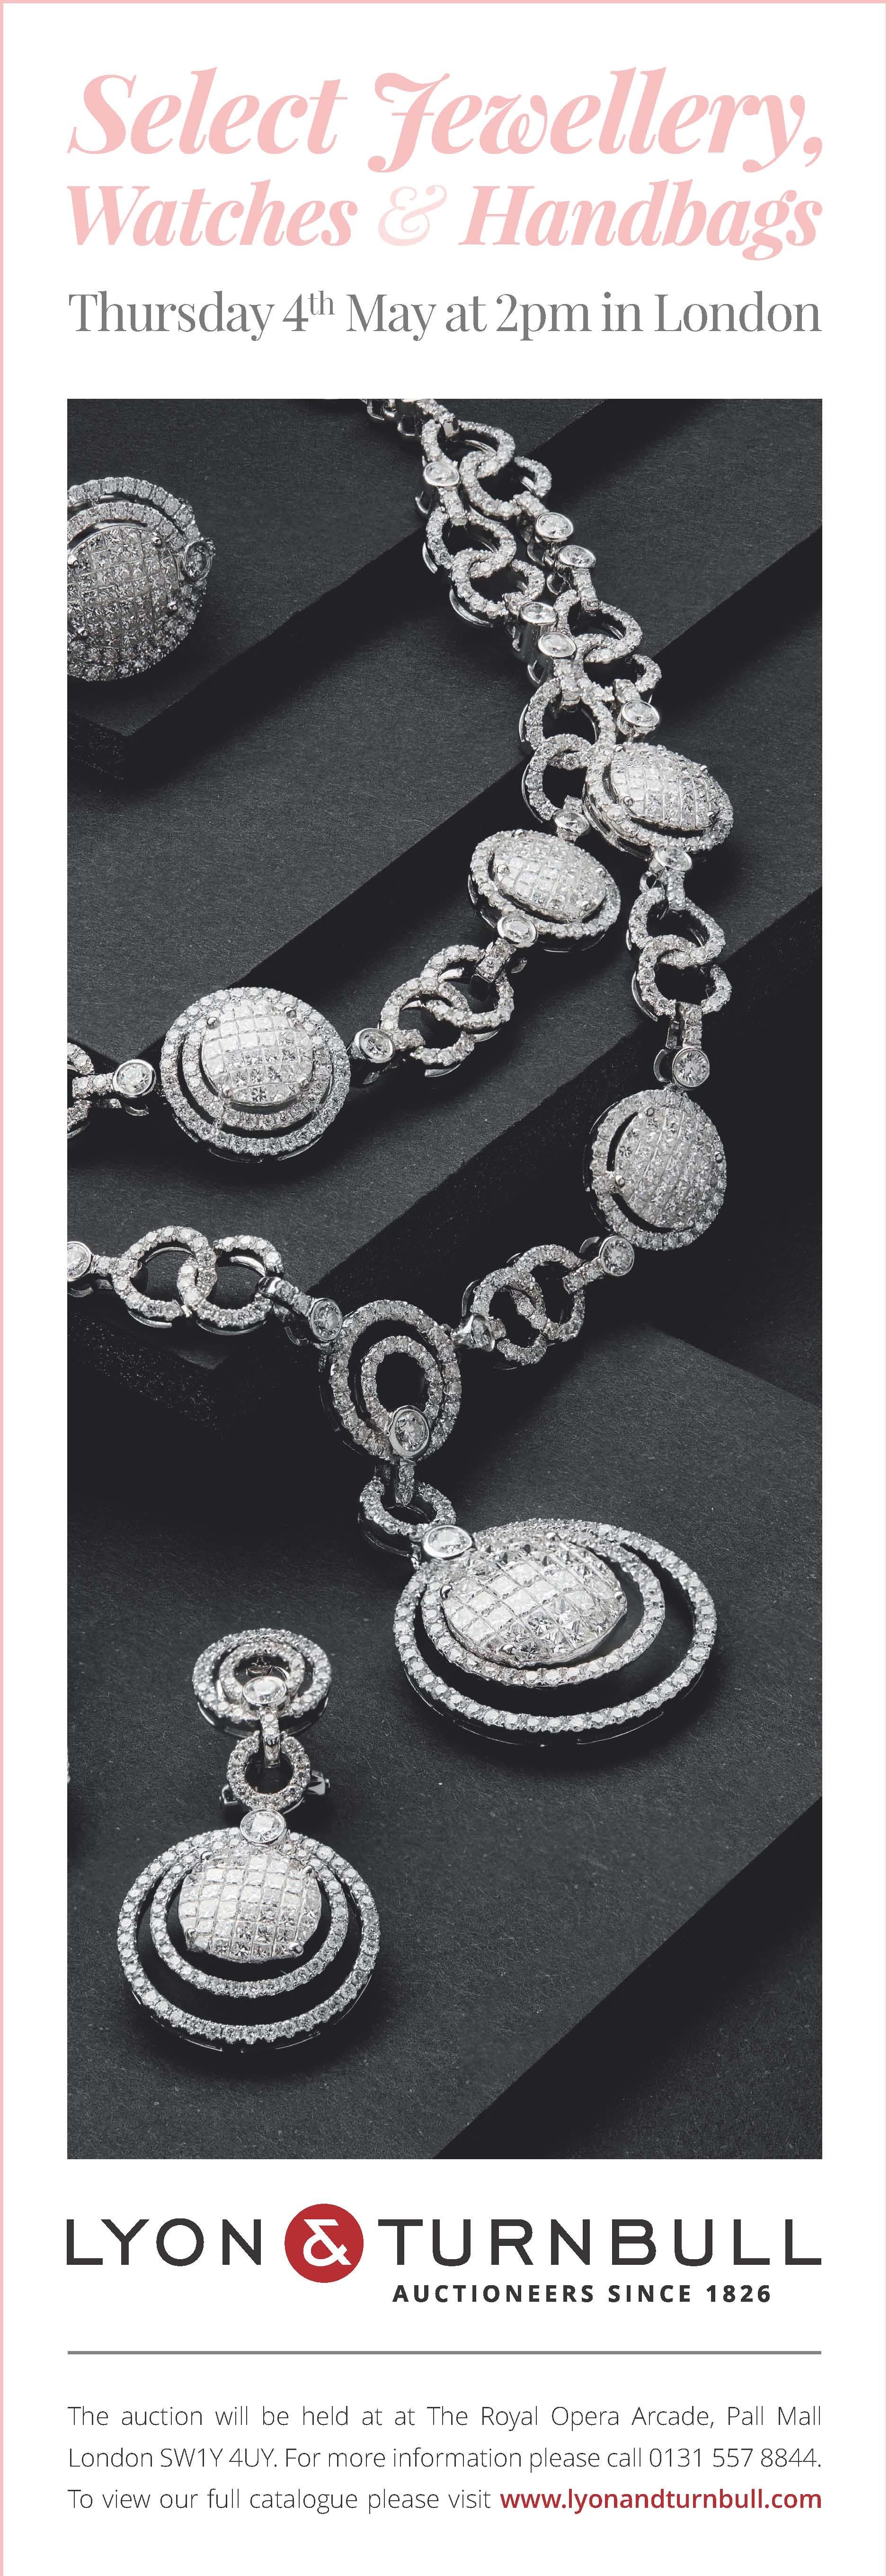 Lyon & Turnbull - Jewellery Watches & Handbags.jpg